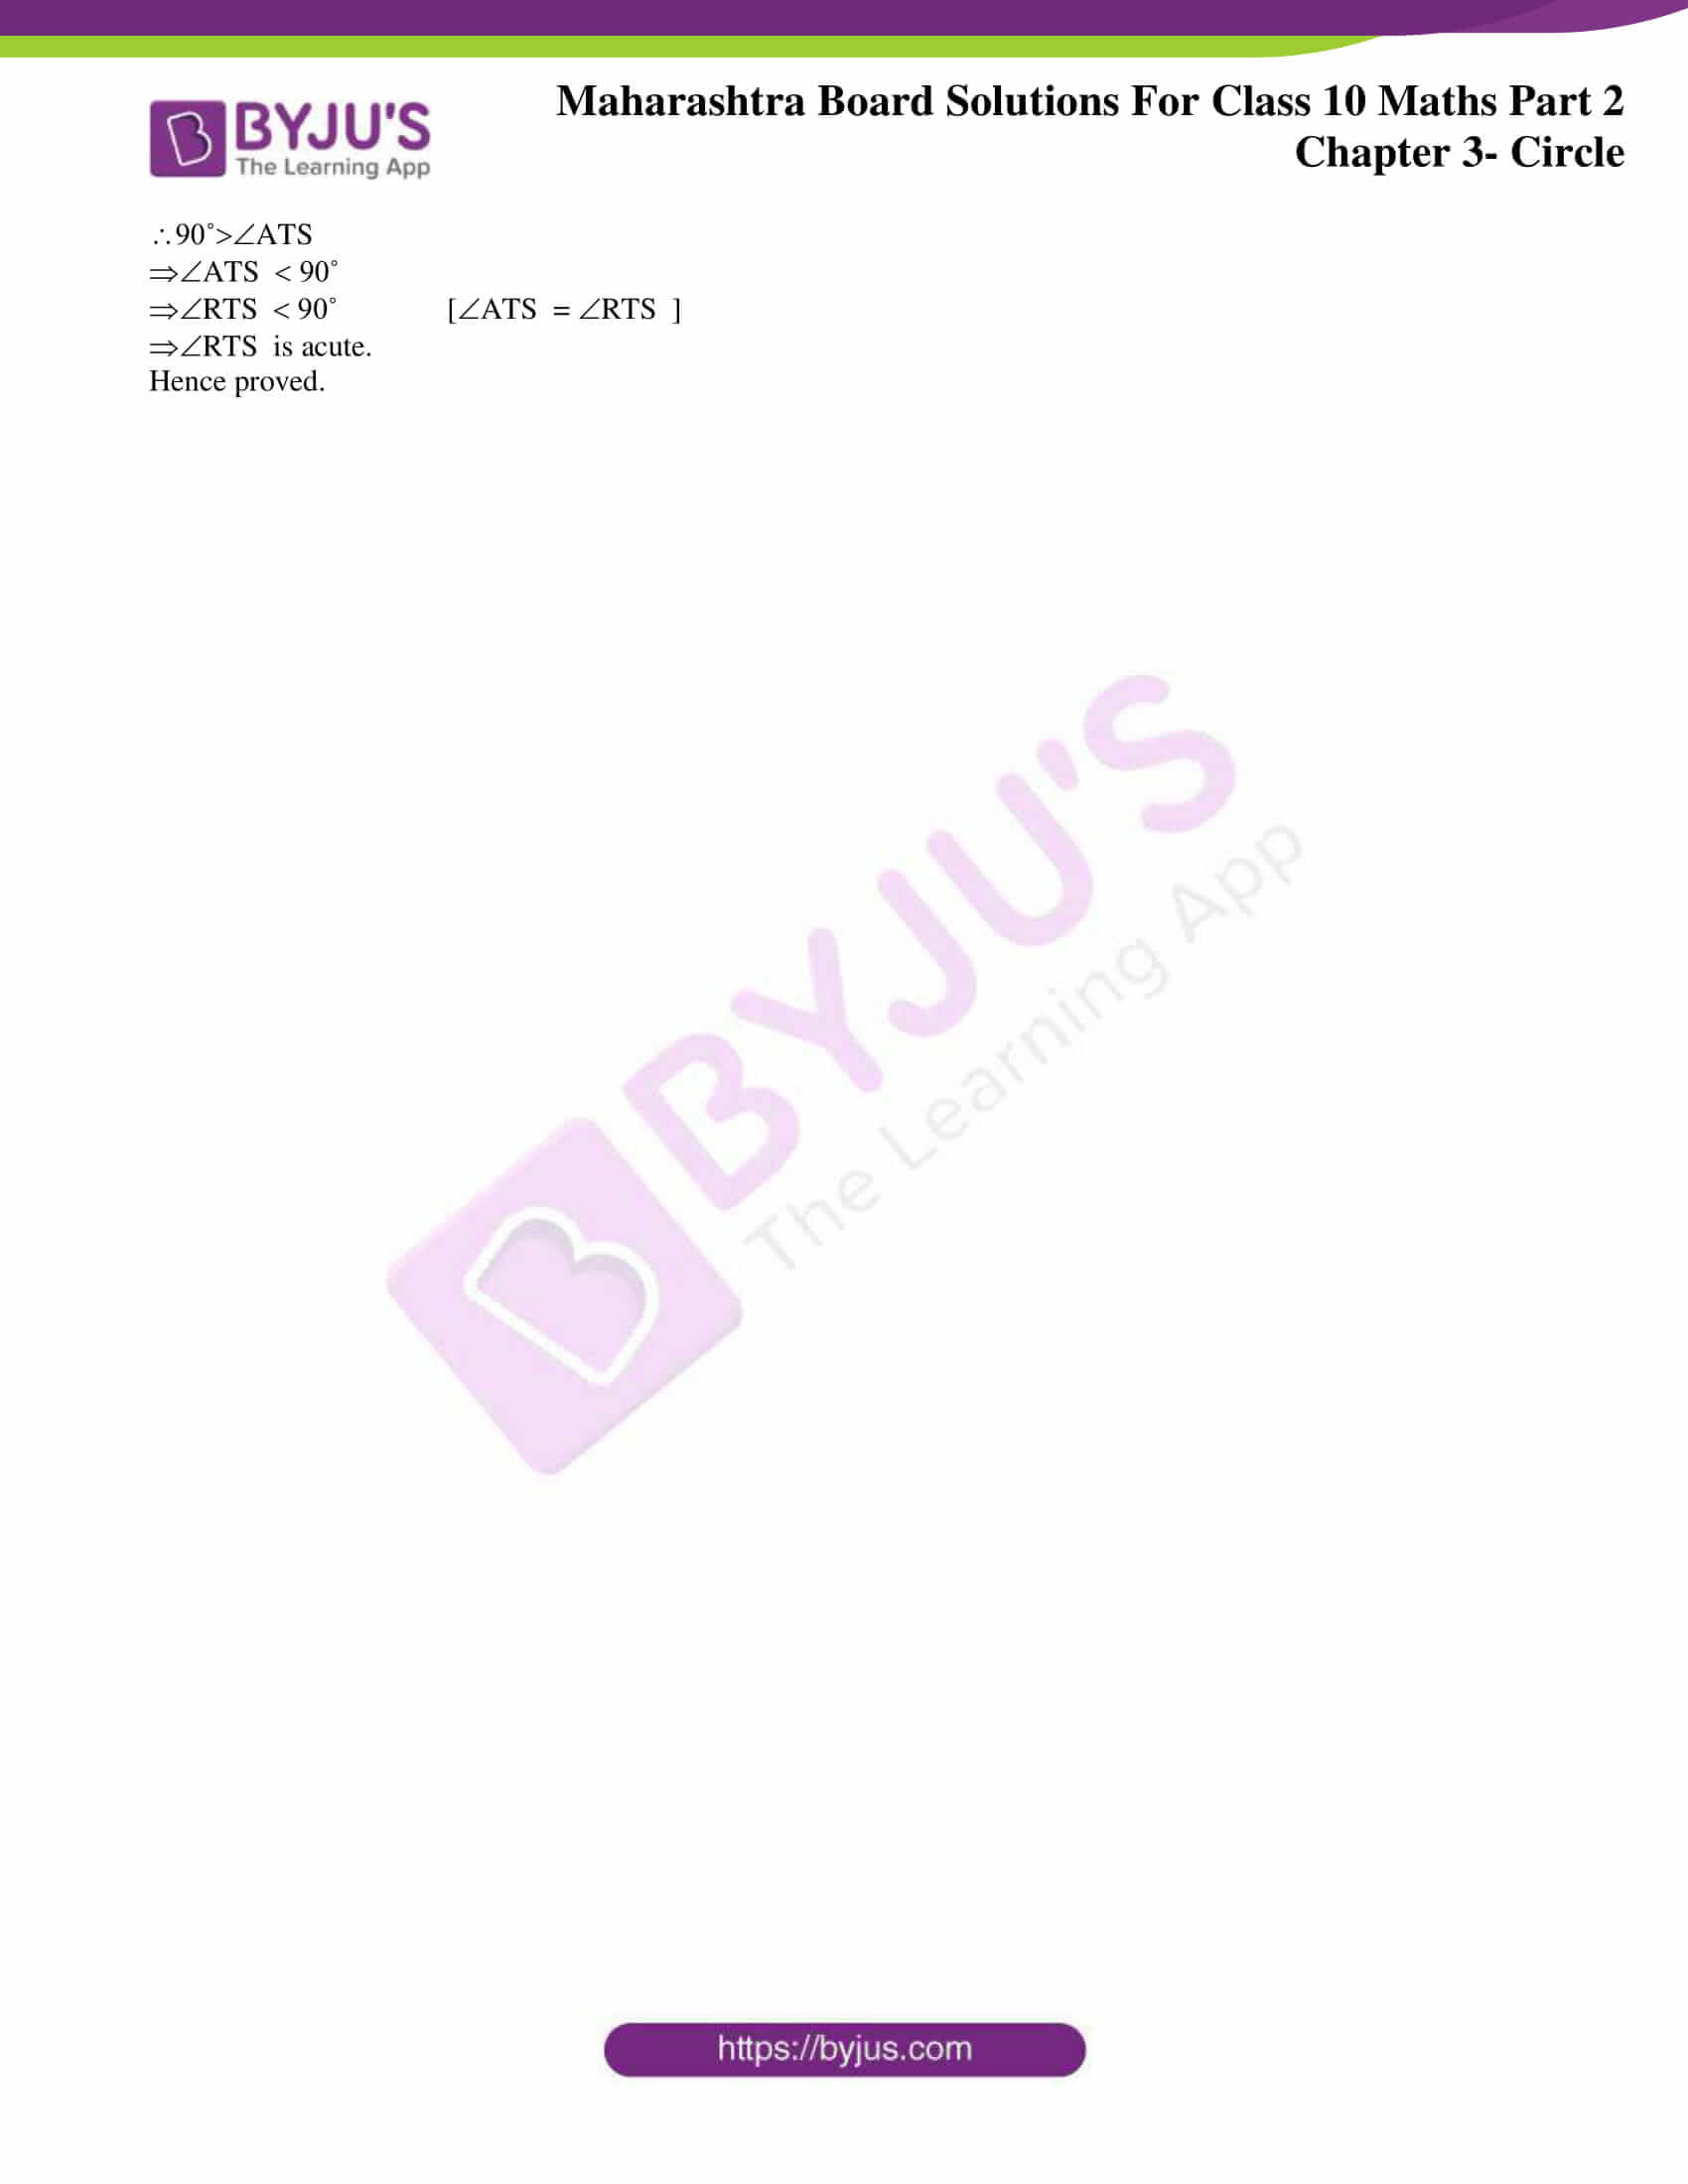 msbshse sol class 10 maths part 2 chapter 3 13